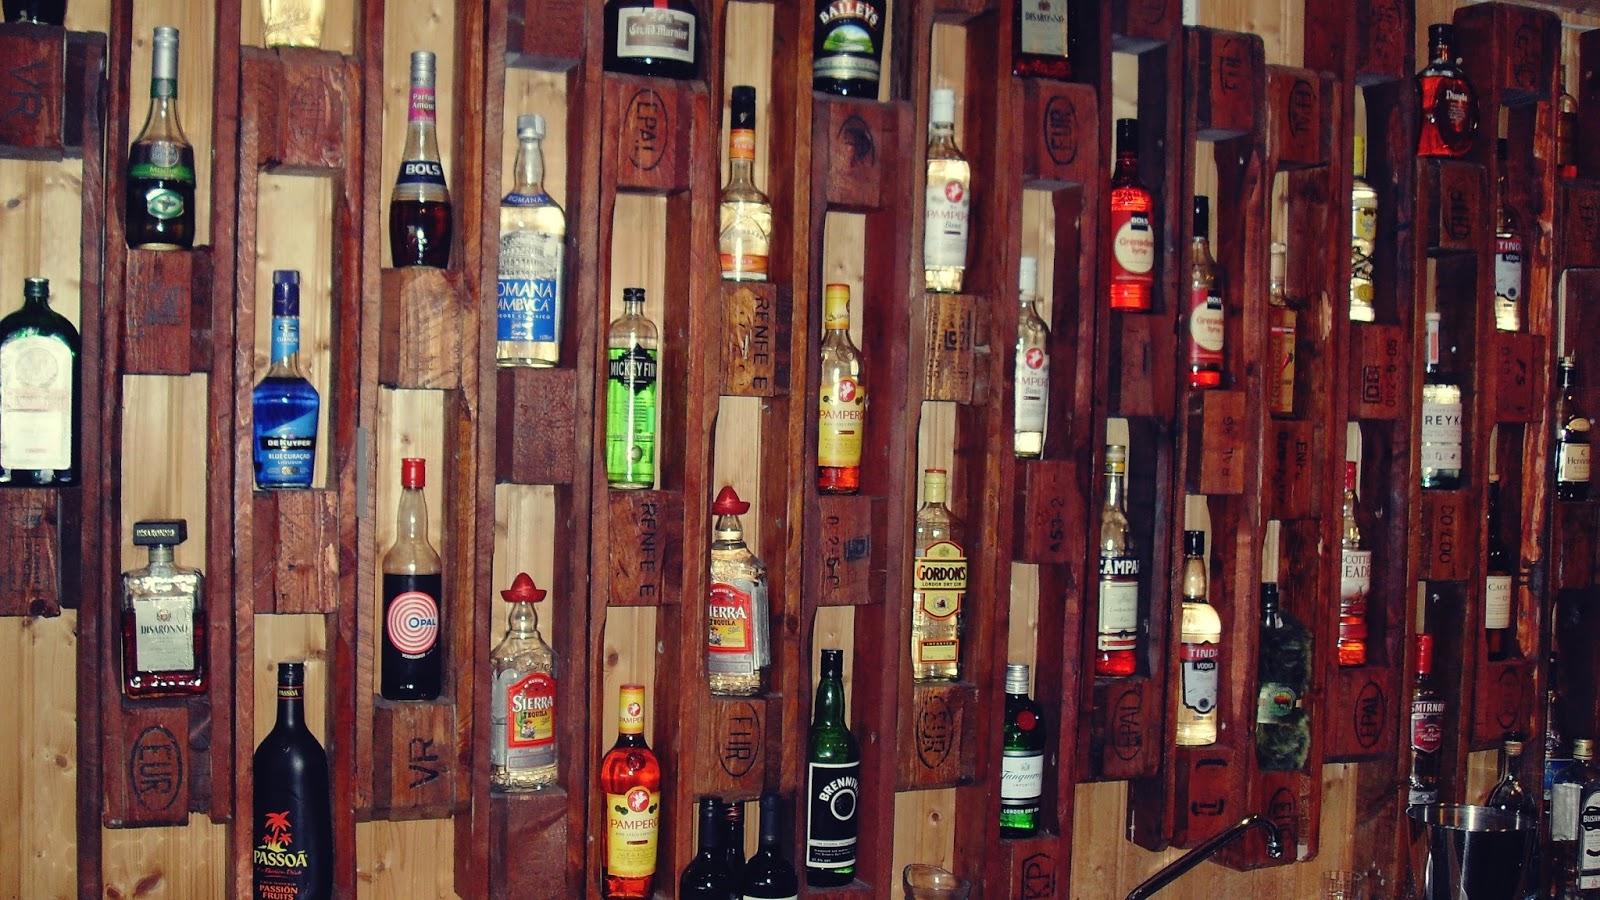 islandzki bar, islandzki Alkohol, Islandia alkohol